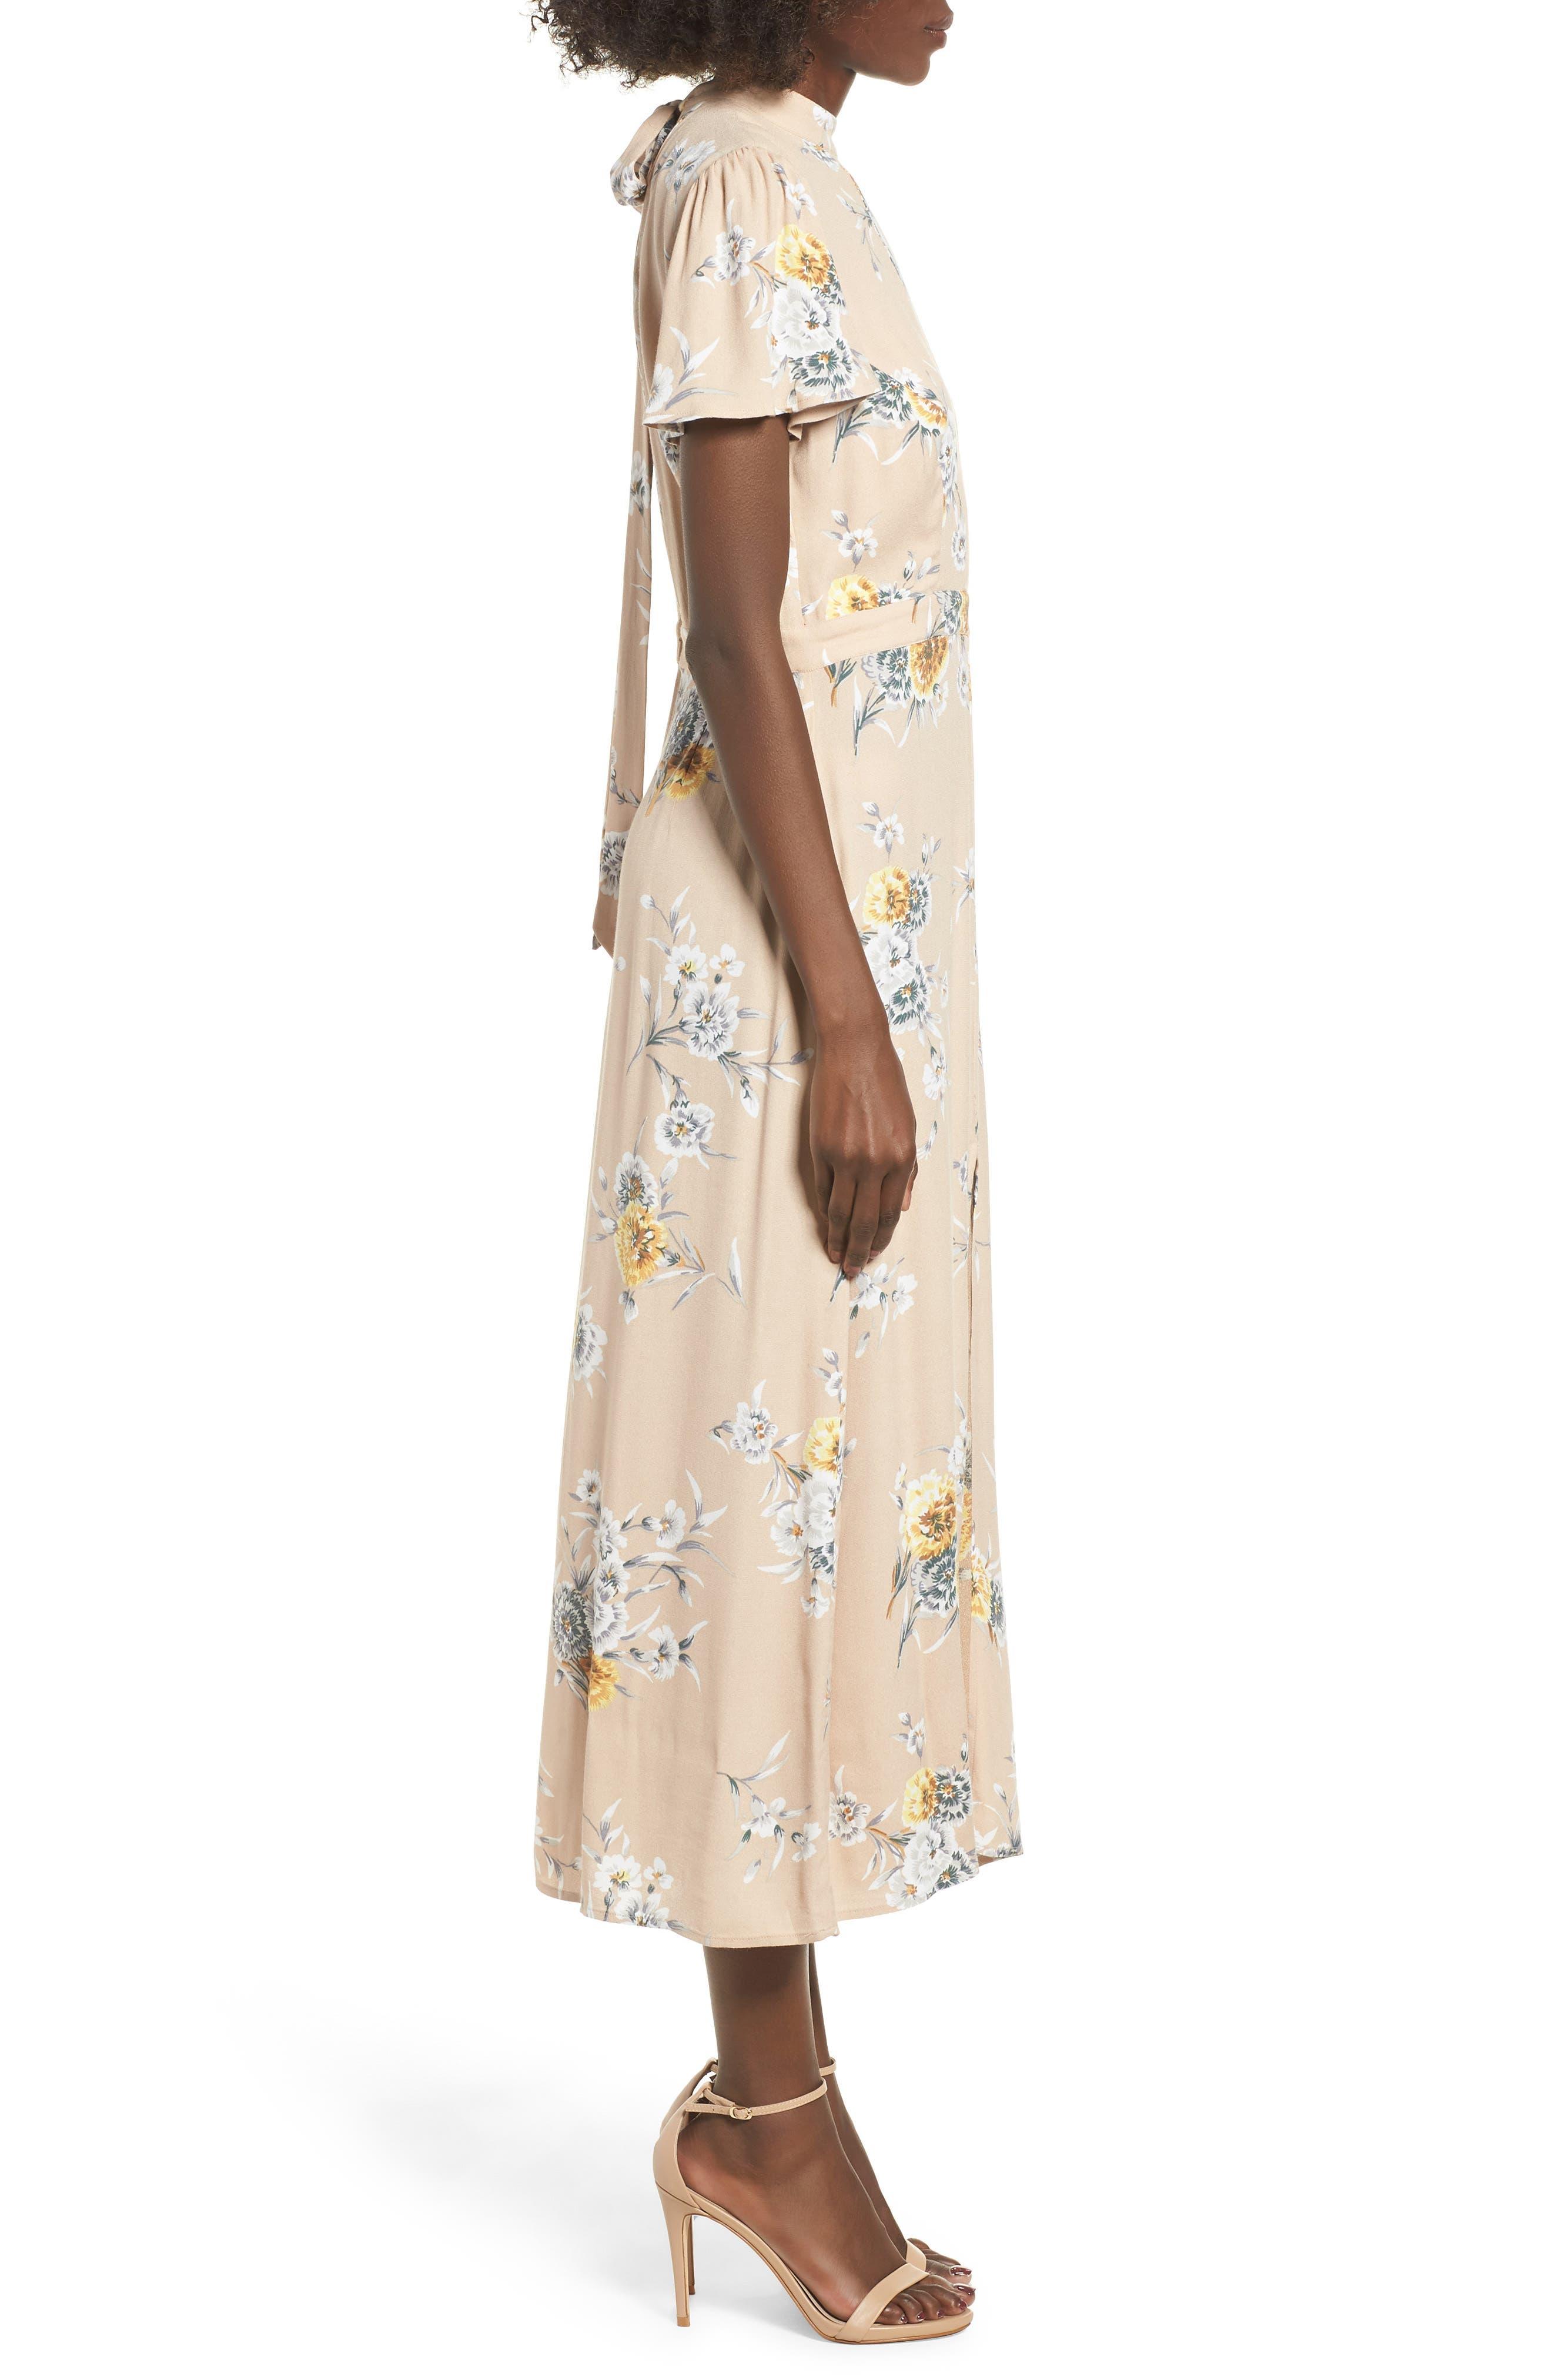 Aliana Tie Detail Dress,                             Alternate thumbnail 3, color,                             294